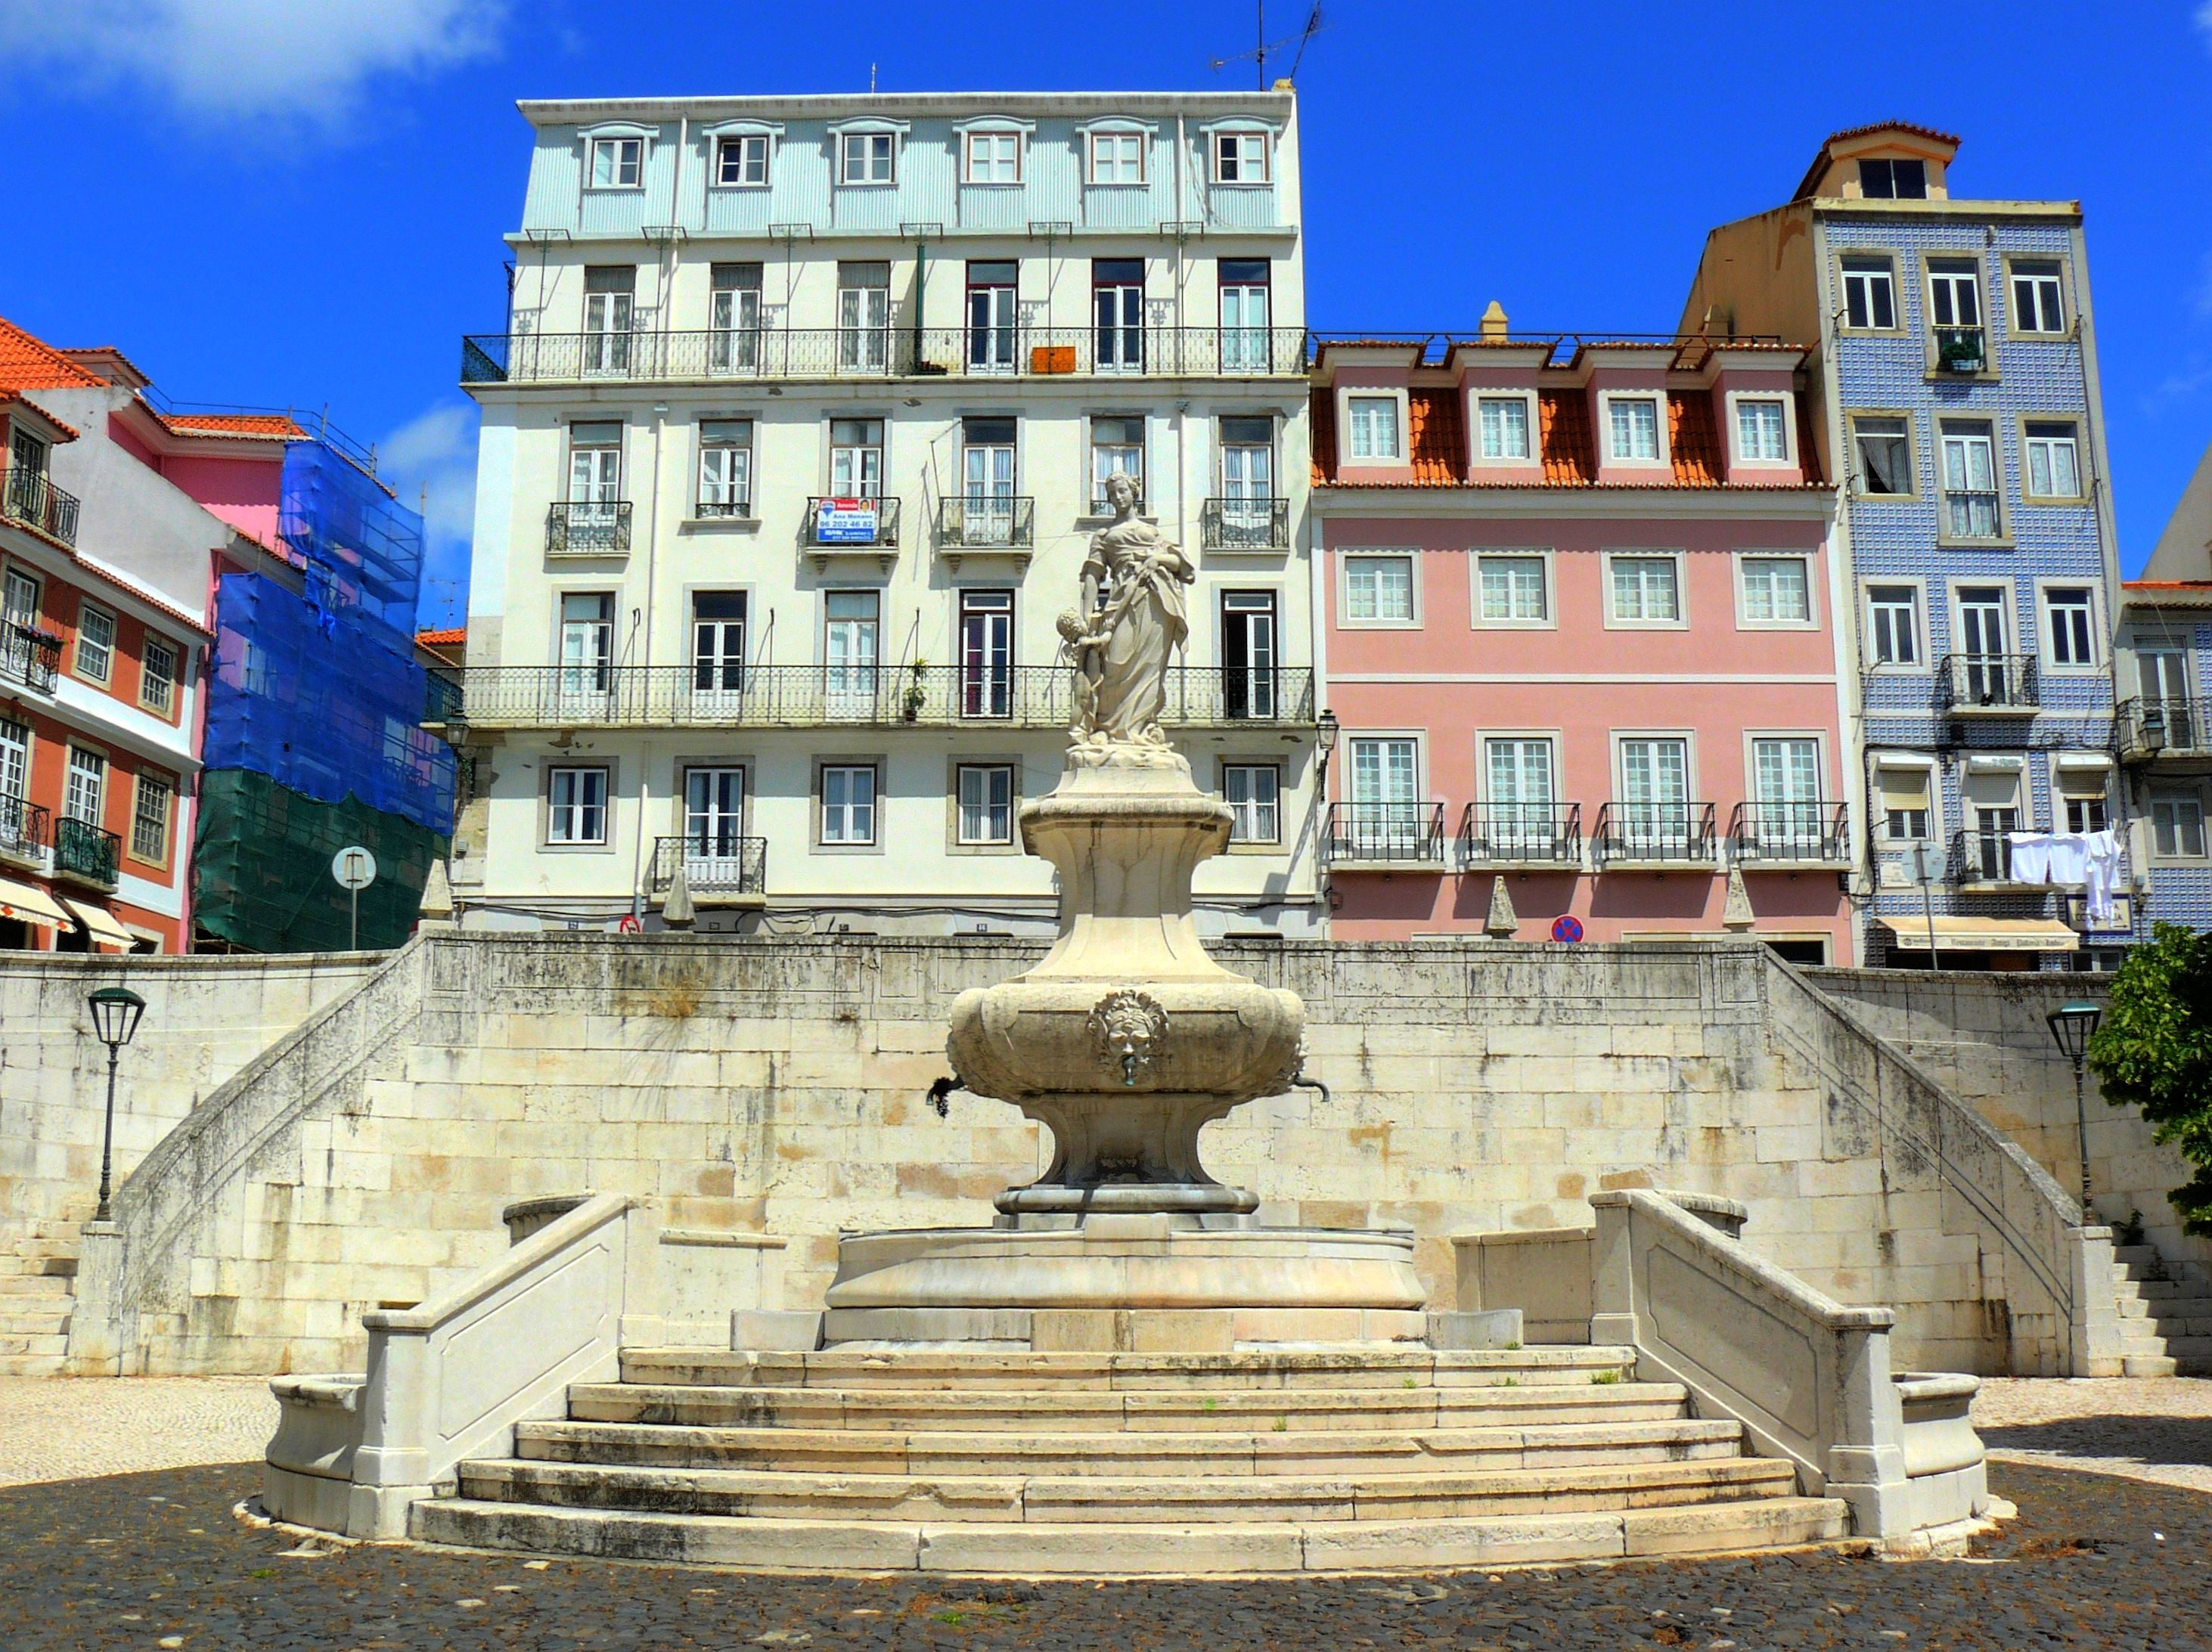 #0A46C1 Pinterest • The world's catalog of ideas 702 Janelas Verdes Lisbon